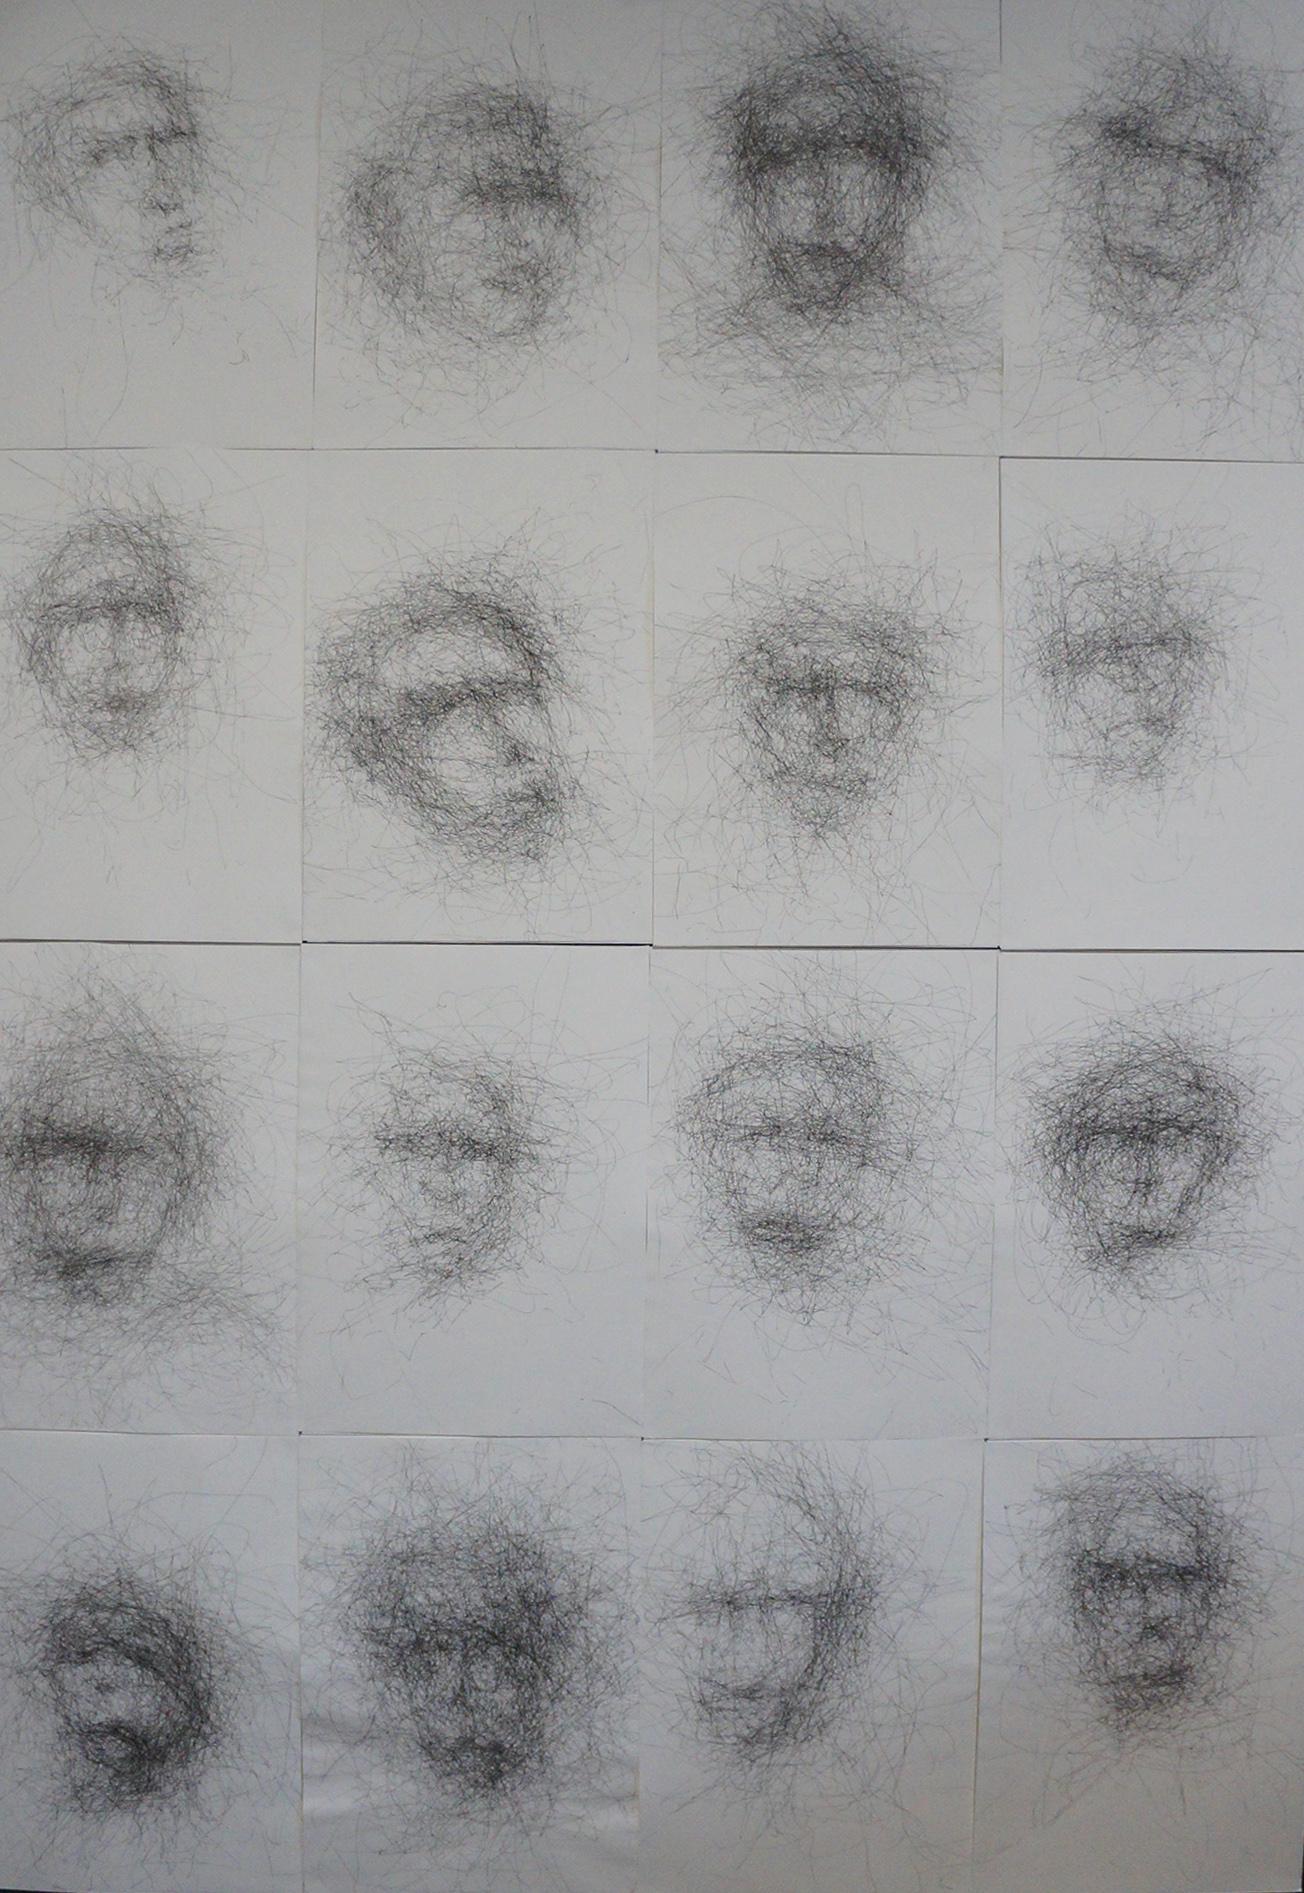 Durbach_Steven_Chaotic Self Portraits